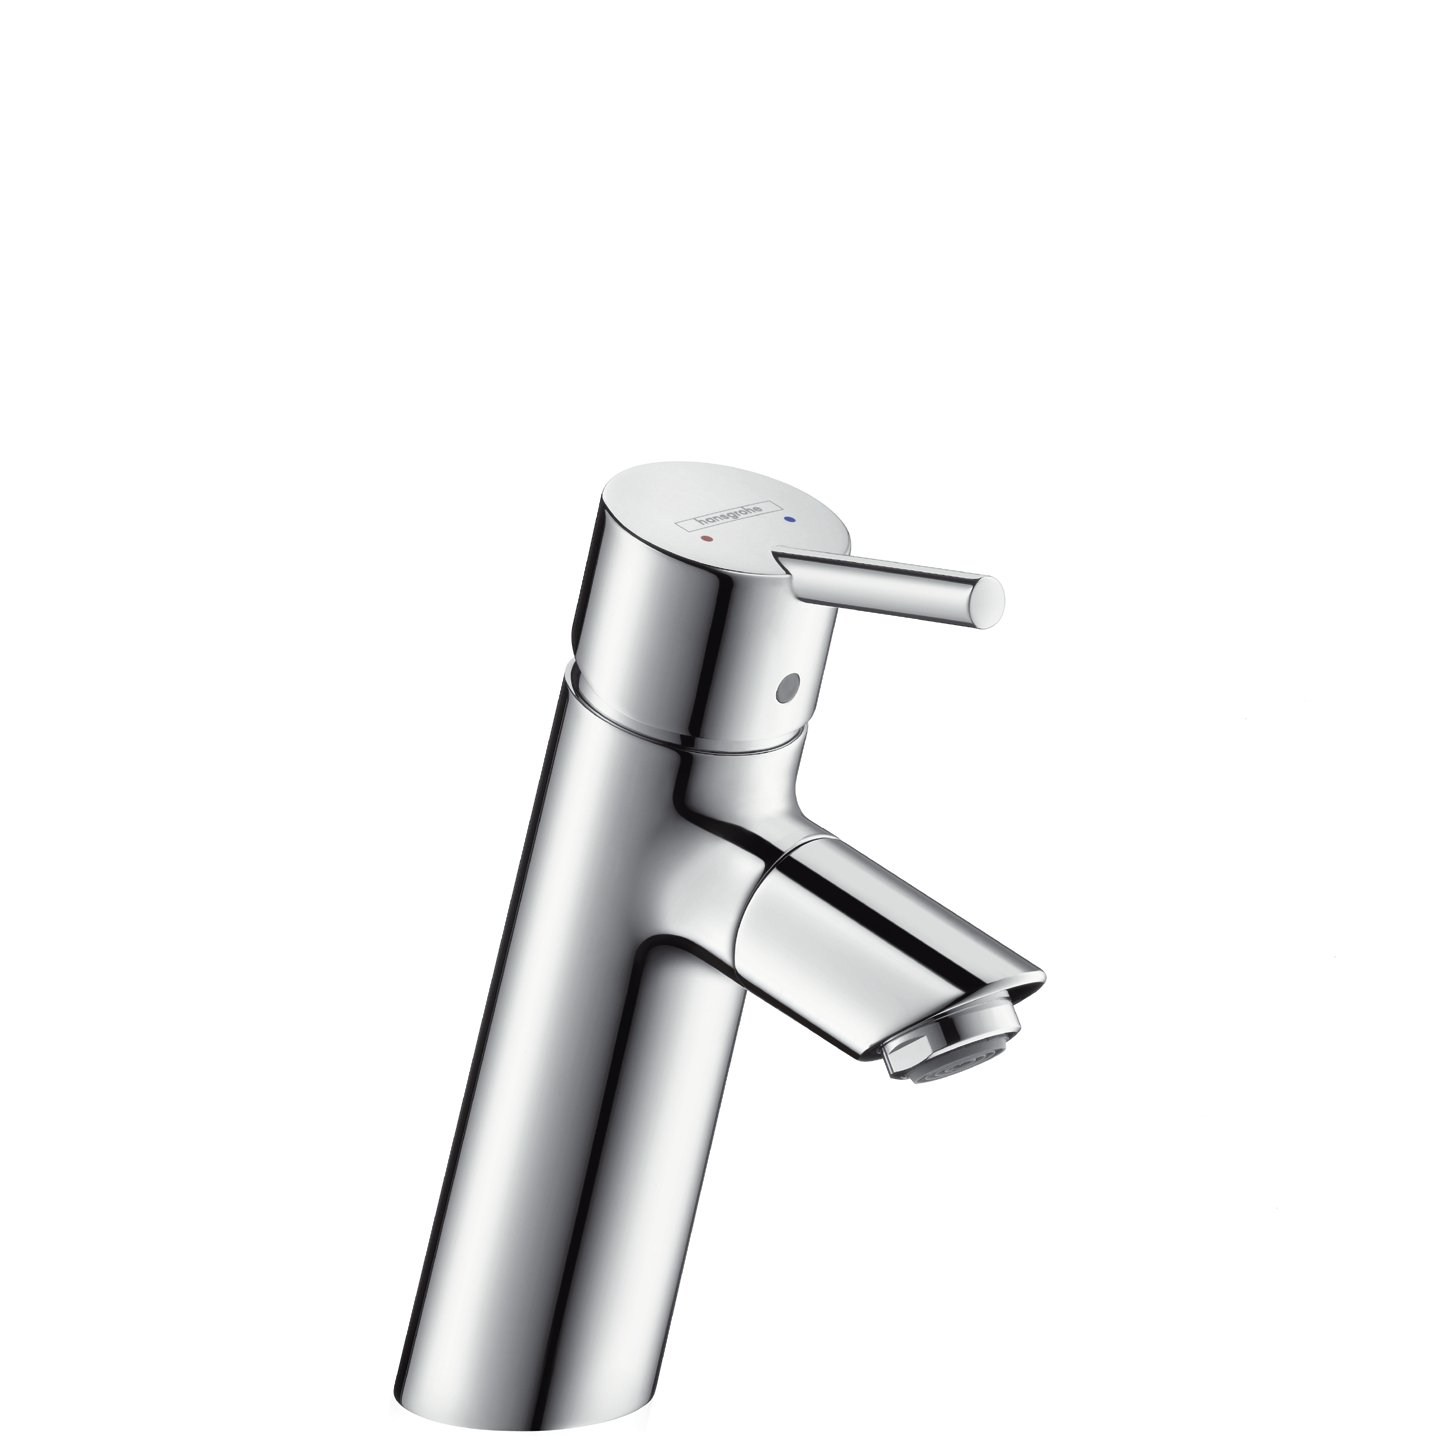 Amazon.com: Hansgrohe 32053000 Talis 80 Chrome Basin Mixer Tap: Home ...